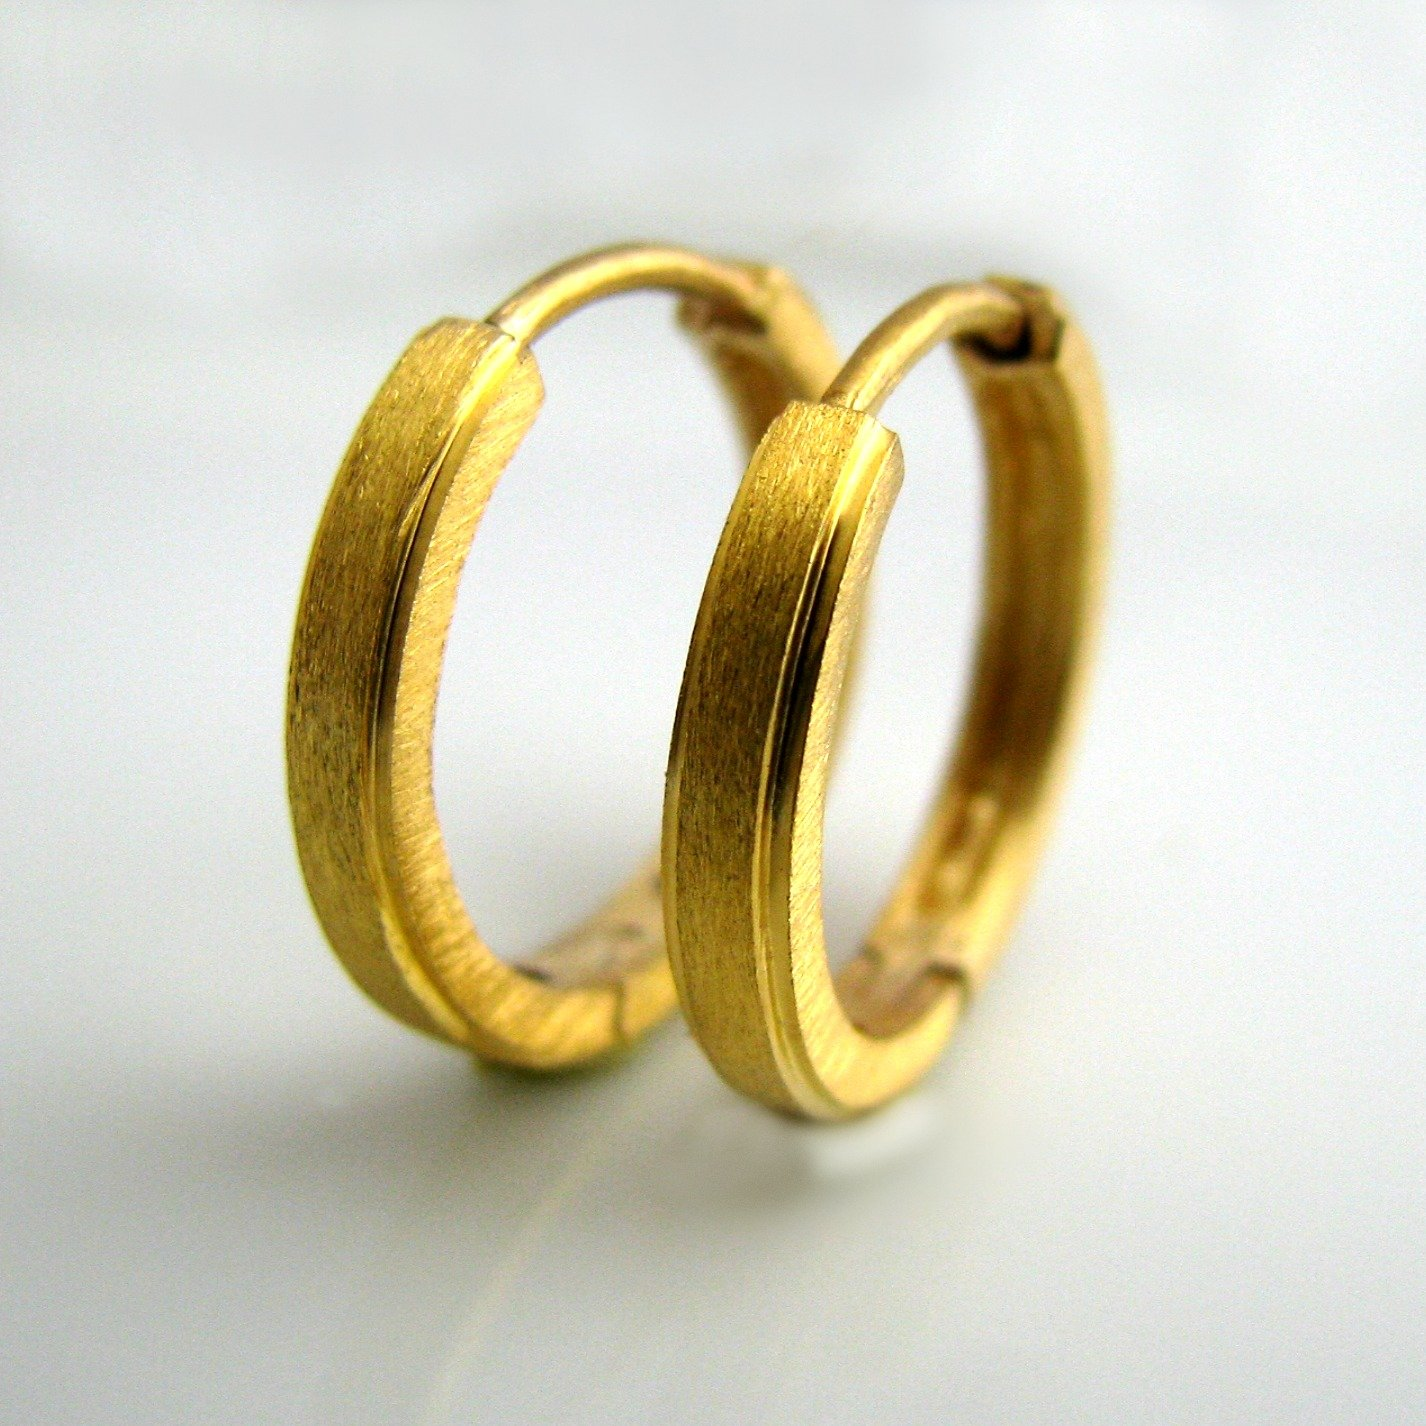 Earrings for men hoops 2017